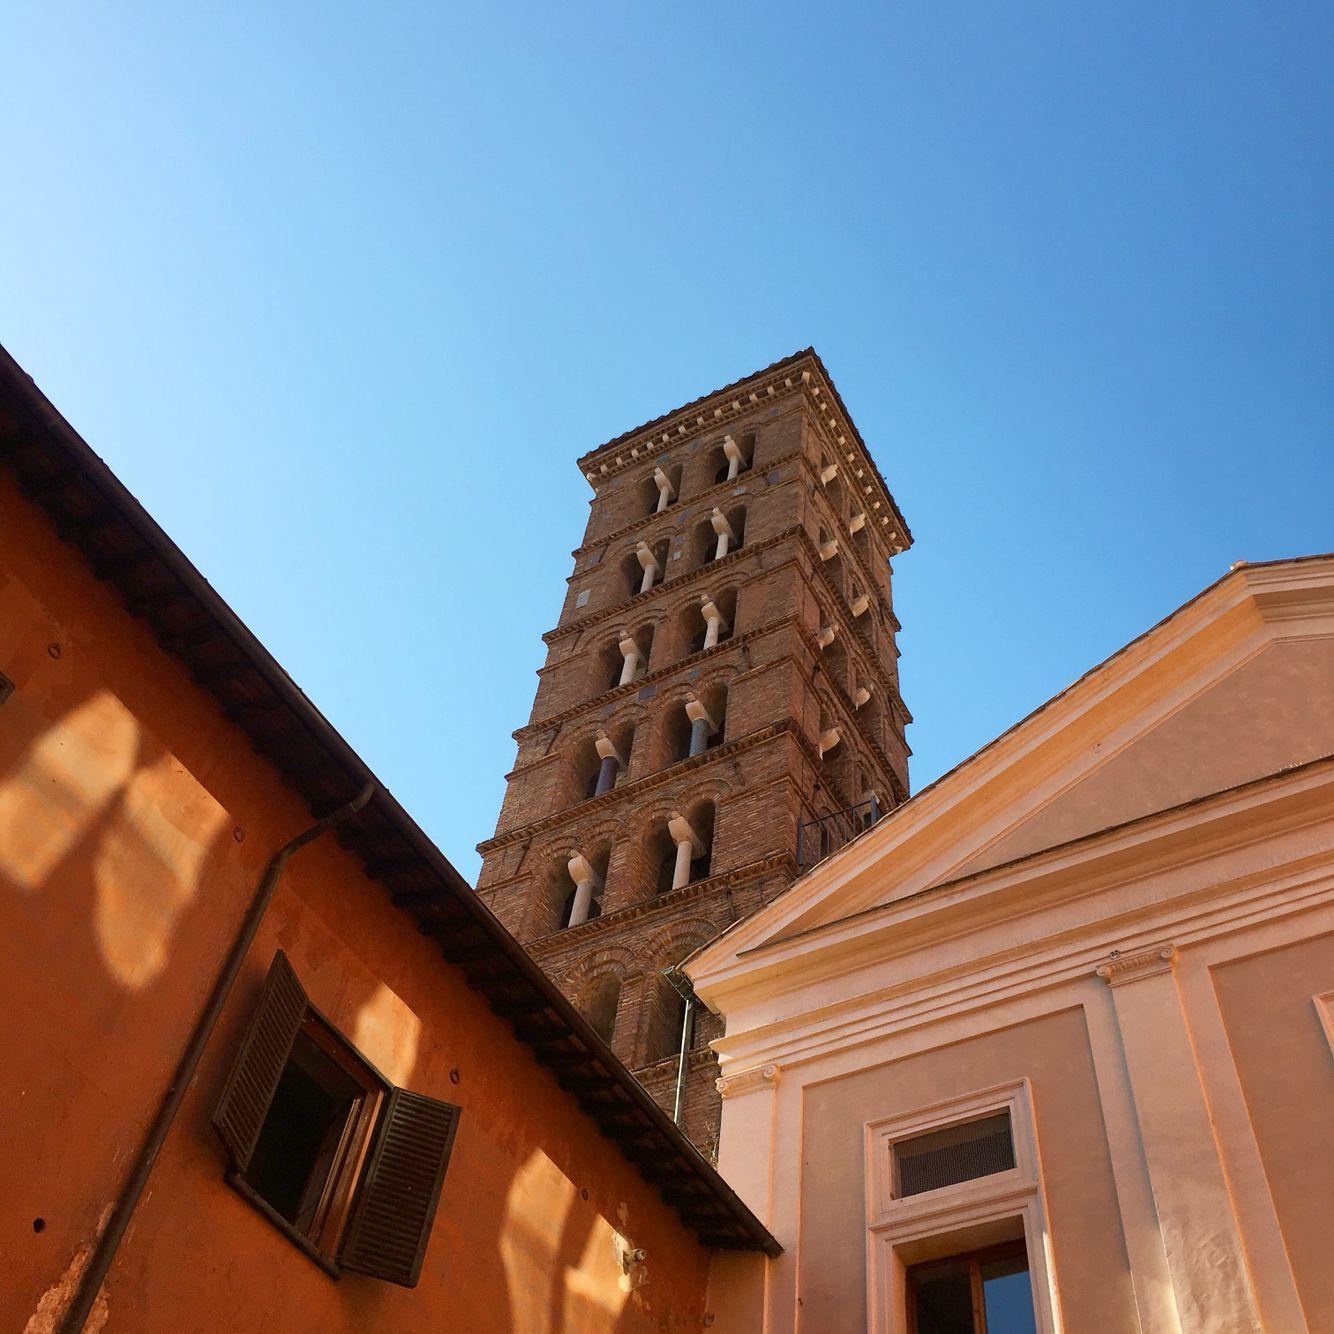 Campanile, Basilique San Silvestro - Avr 2016 ©ROME Pratique